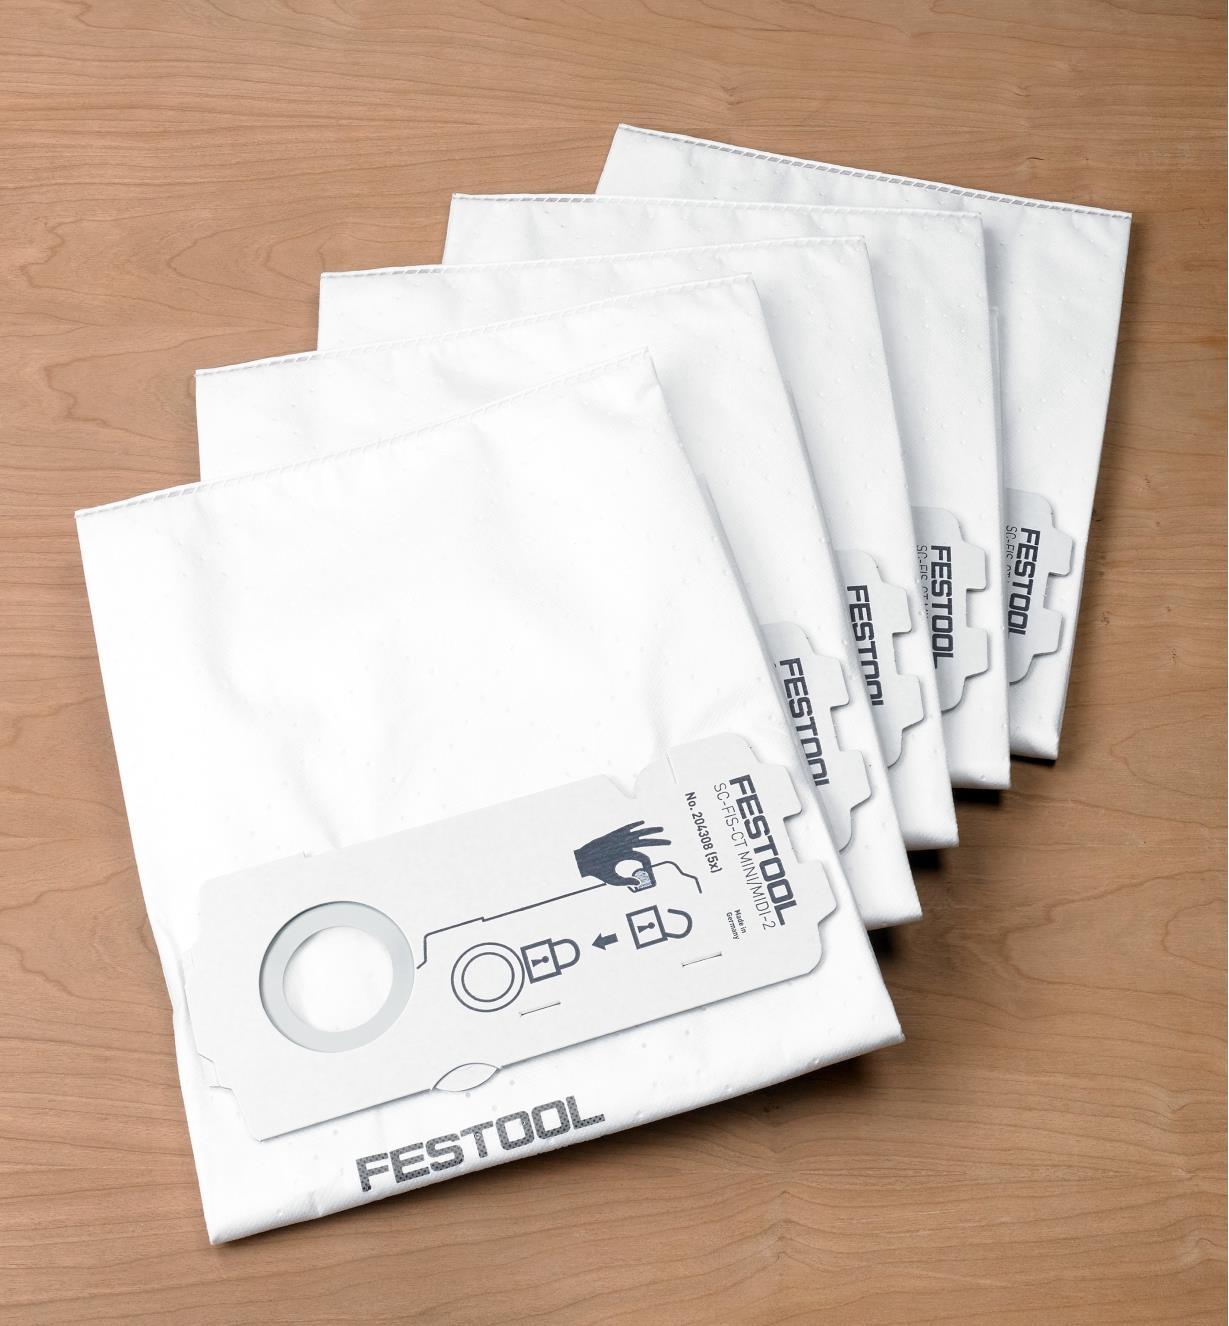 Selfclean Filter Bags for MINI/MIDI/CT 15, pkg. of 5